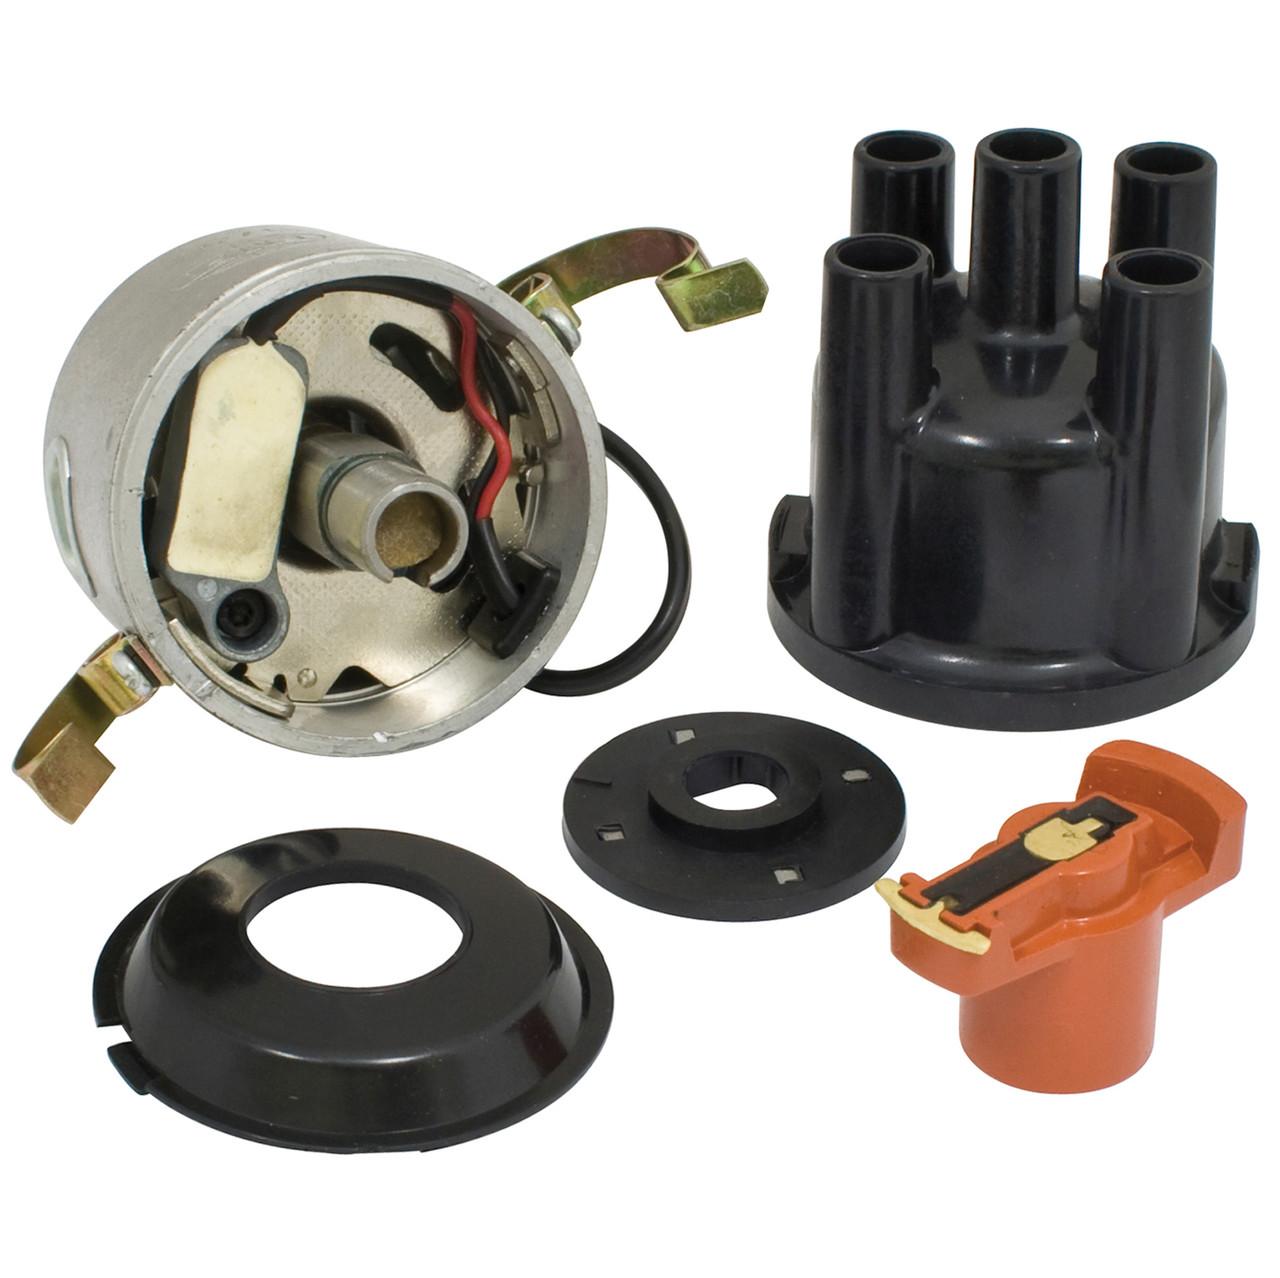 informafutbol.com Bosch Coil Vw Bug Ignition Kit W/Empi 9441 ...